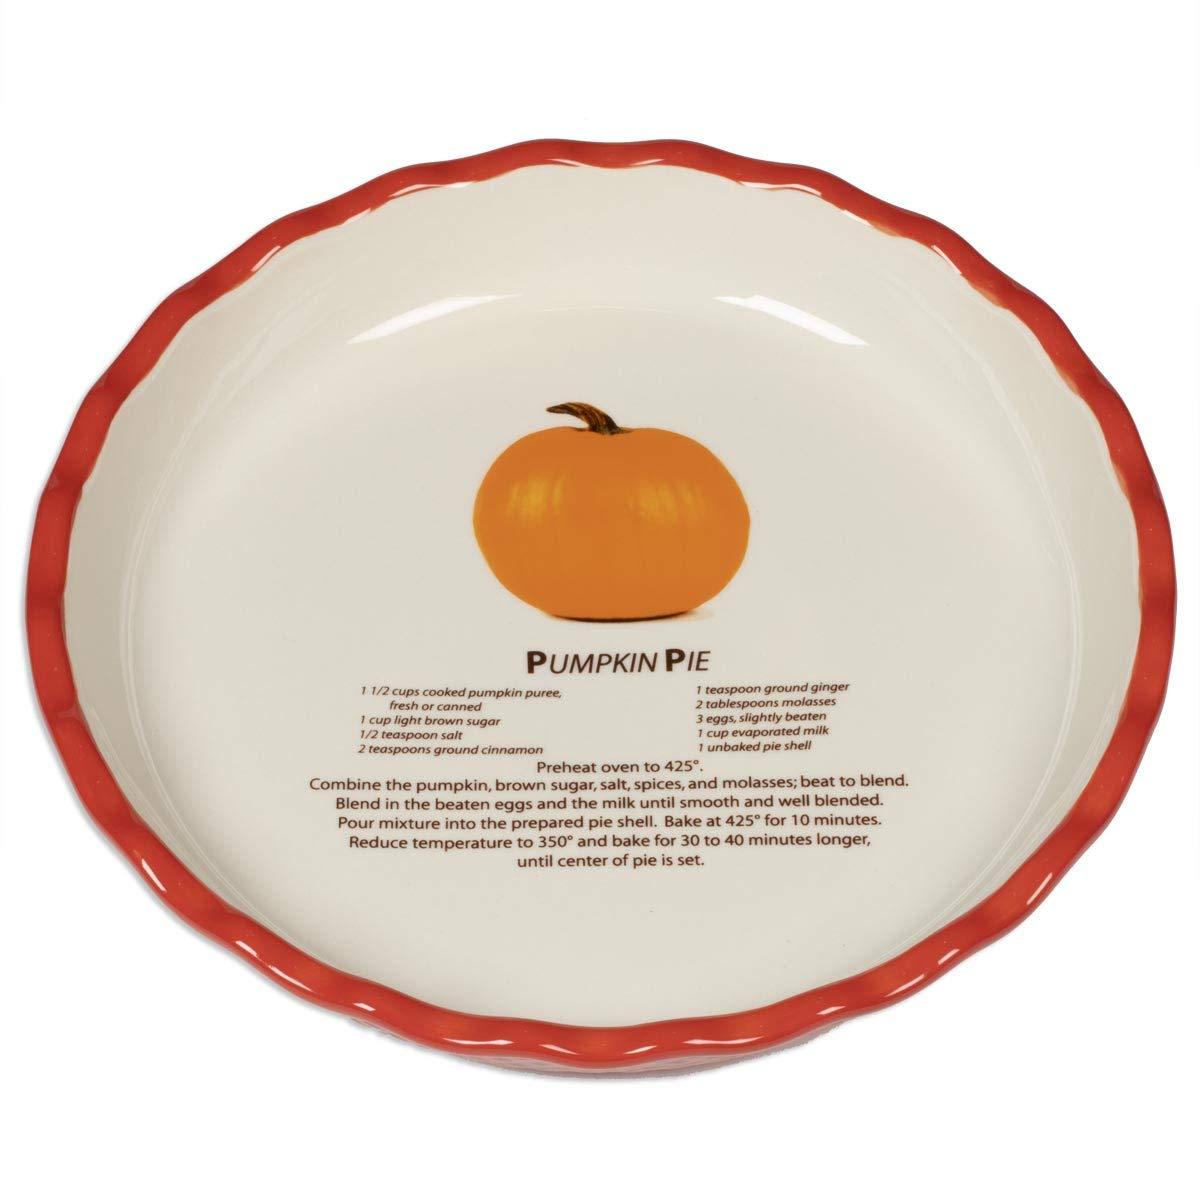 Harbottle House Round Ceramic Pie Pan Pans Plate Deep Dish 10 inch with Recipe (10'', Pumpkin Pie)